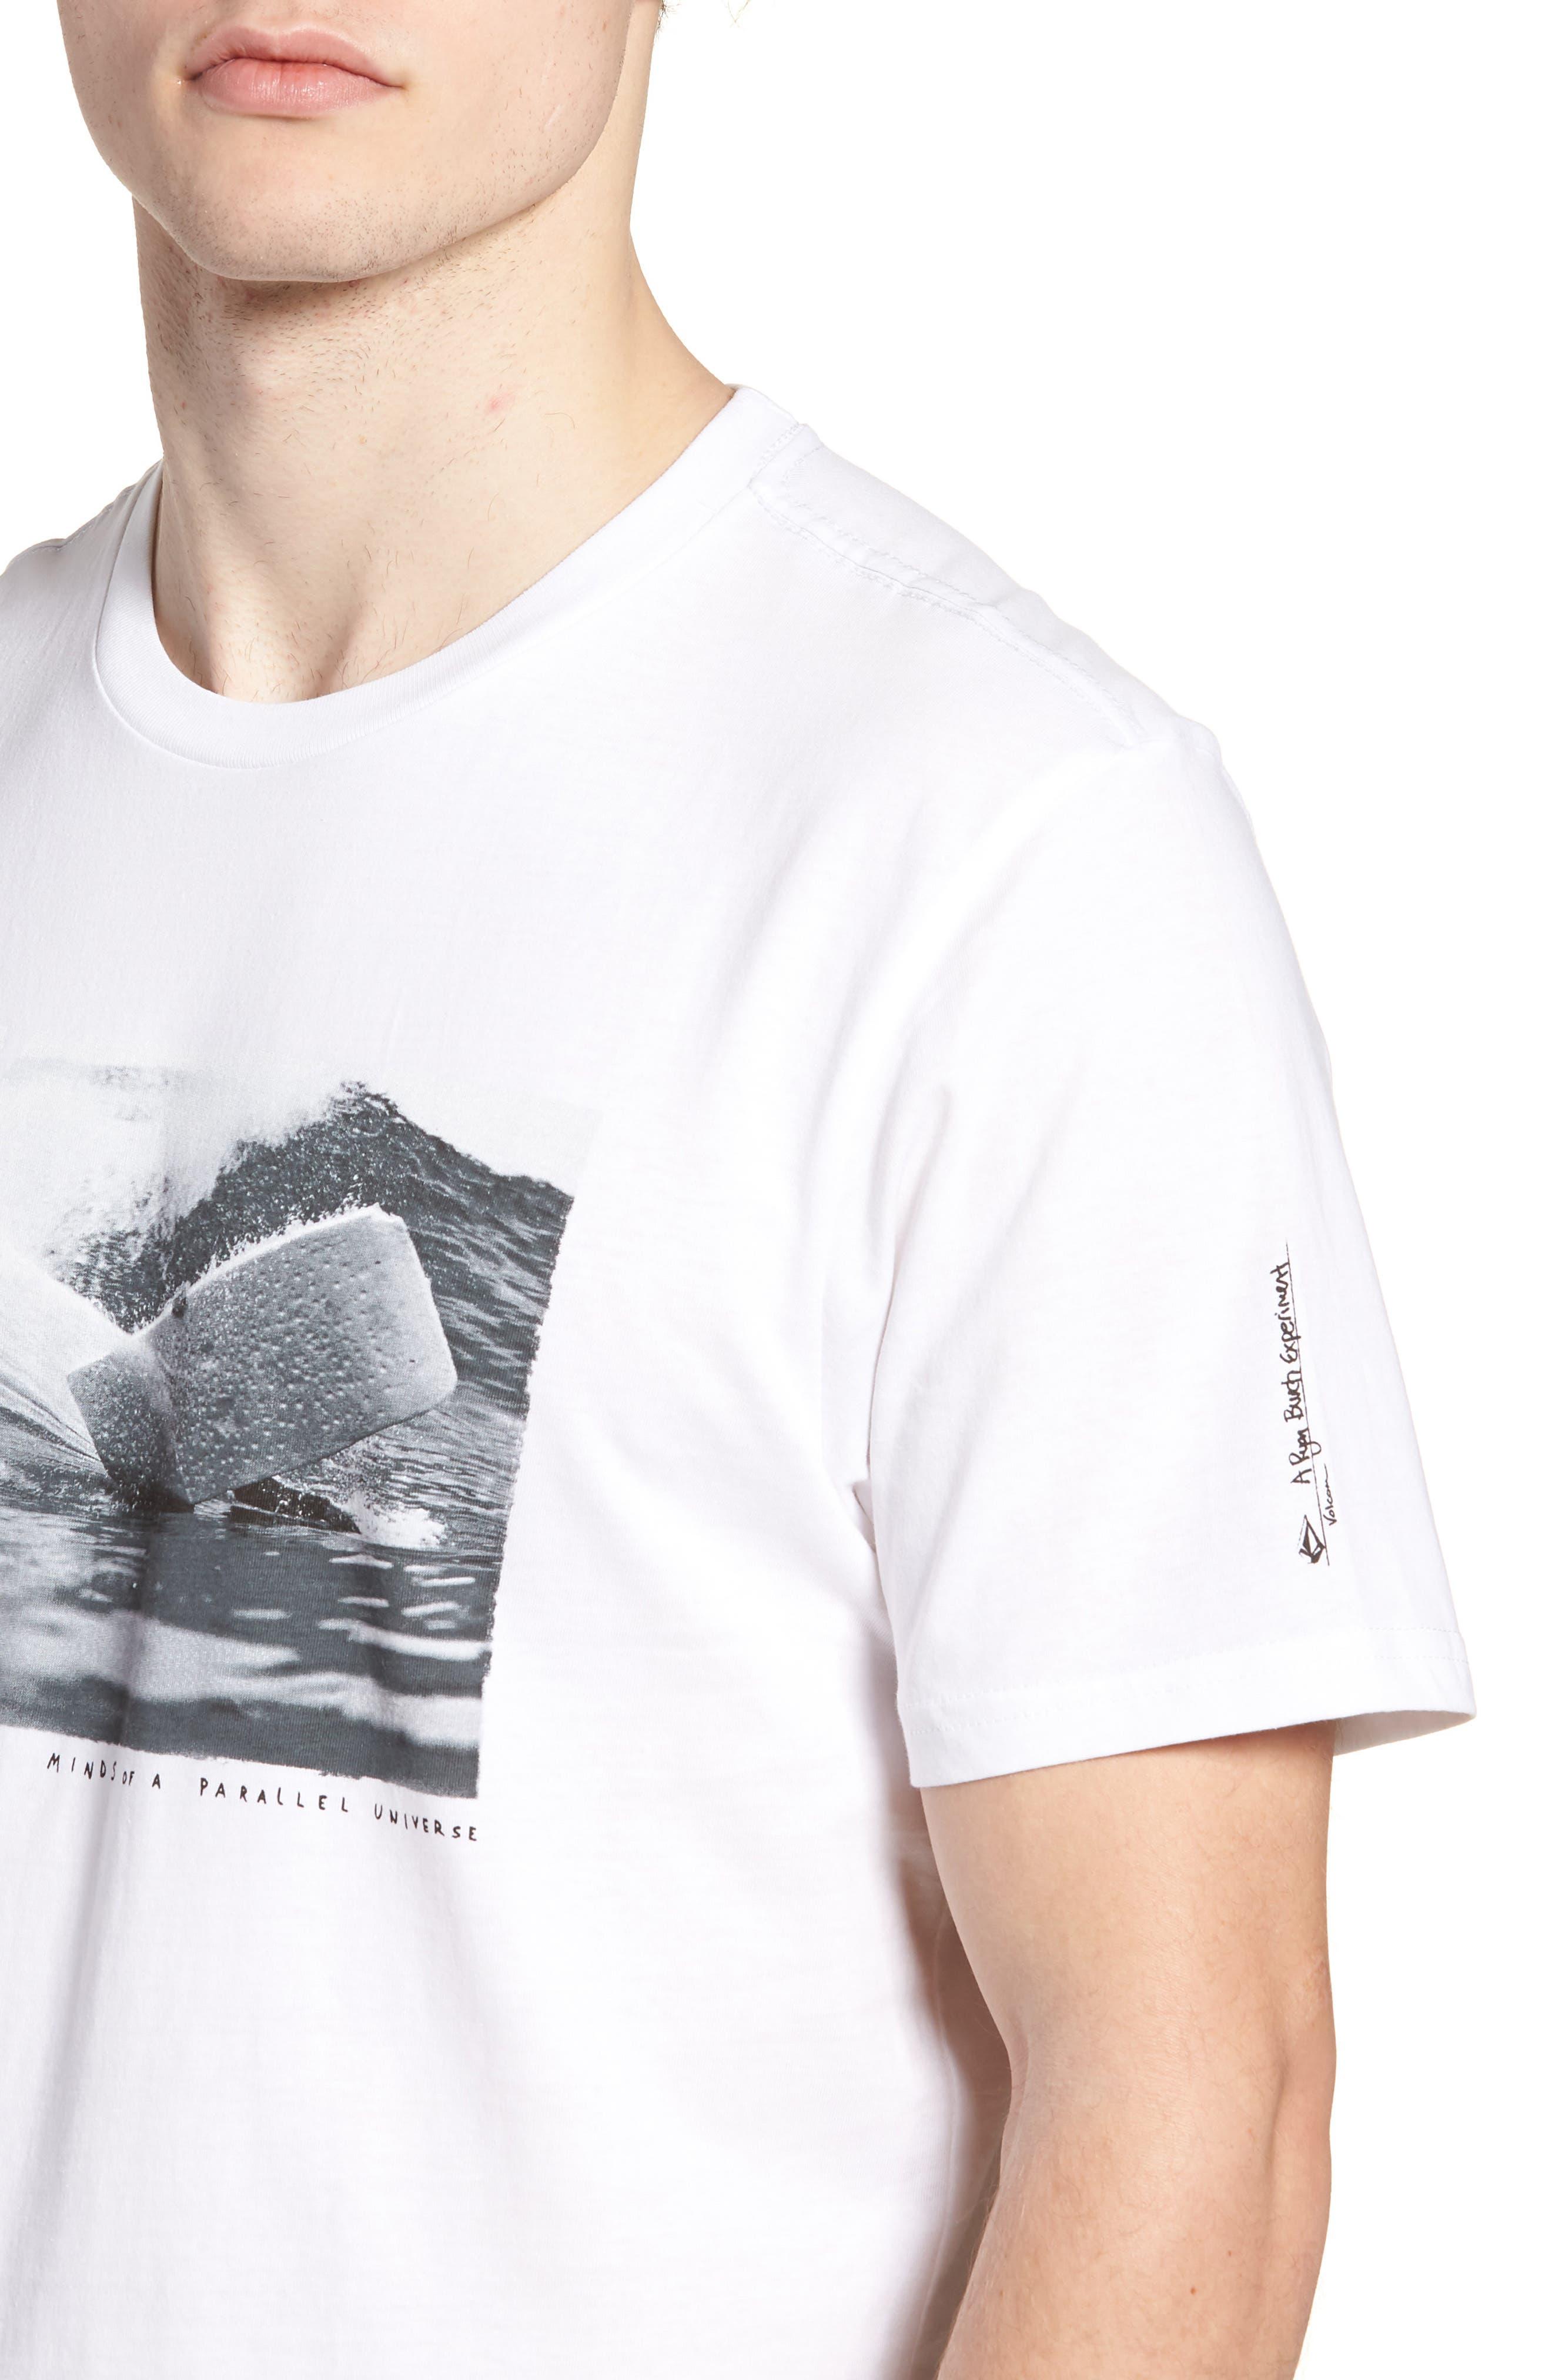 Burch Foam Graphic T-Shirt,                             Alternate thumbnail 4, color,                             100